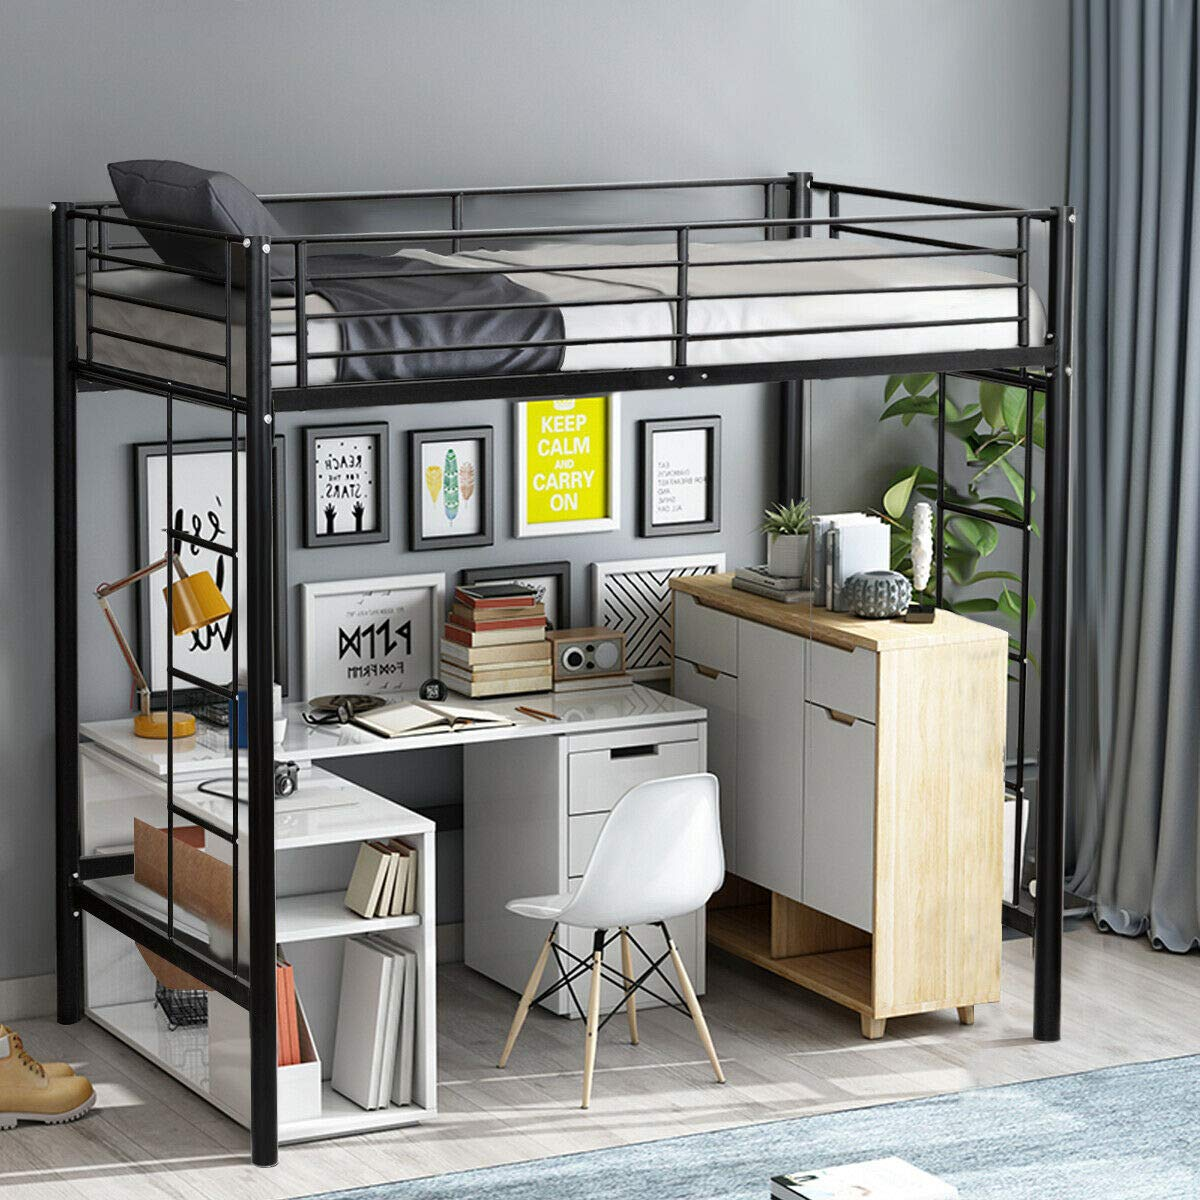 Amazon.com: Twin Loft Bed Metal Bunk Ladder Beds Boys Girls ...